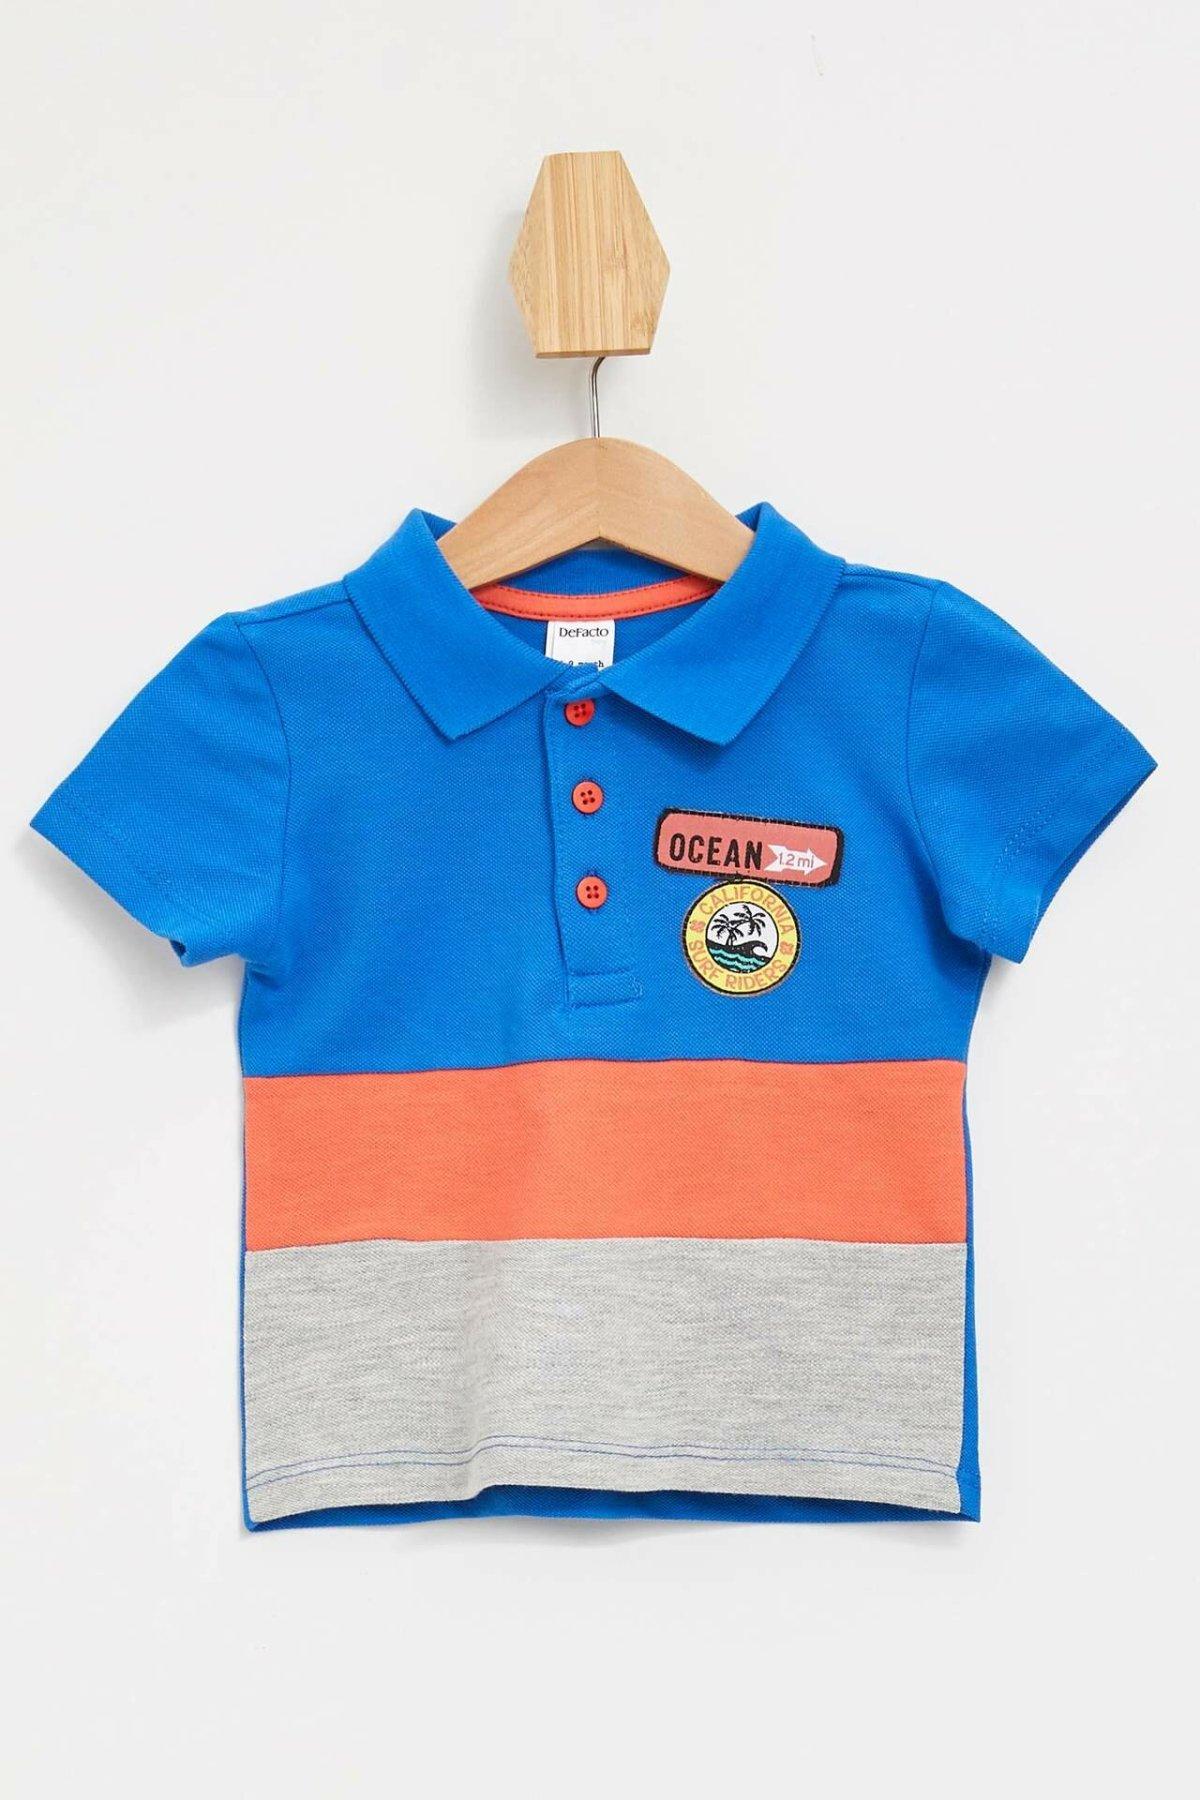 DeFacto Summer Baby Boy Short Sleeve Polo-shirt Kids Casual Striepd T-Shirt Children Comfort Simple Tops New - K8266A219SM